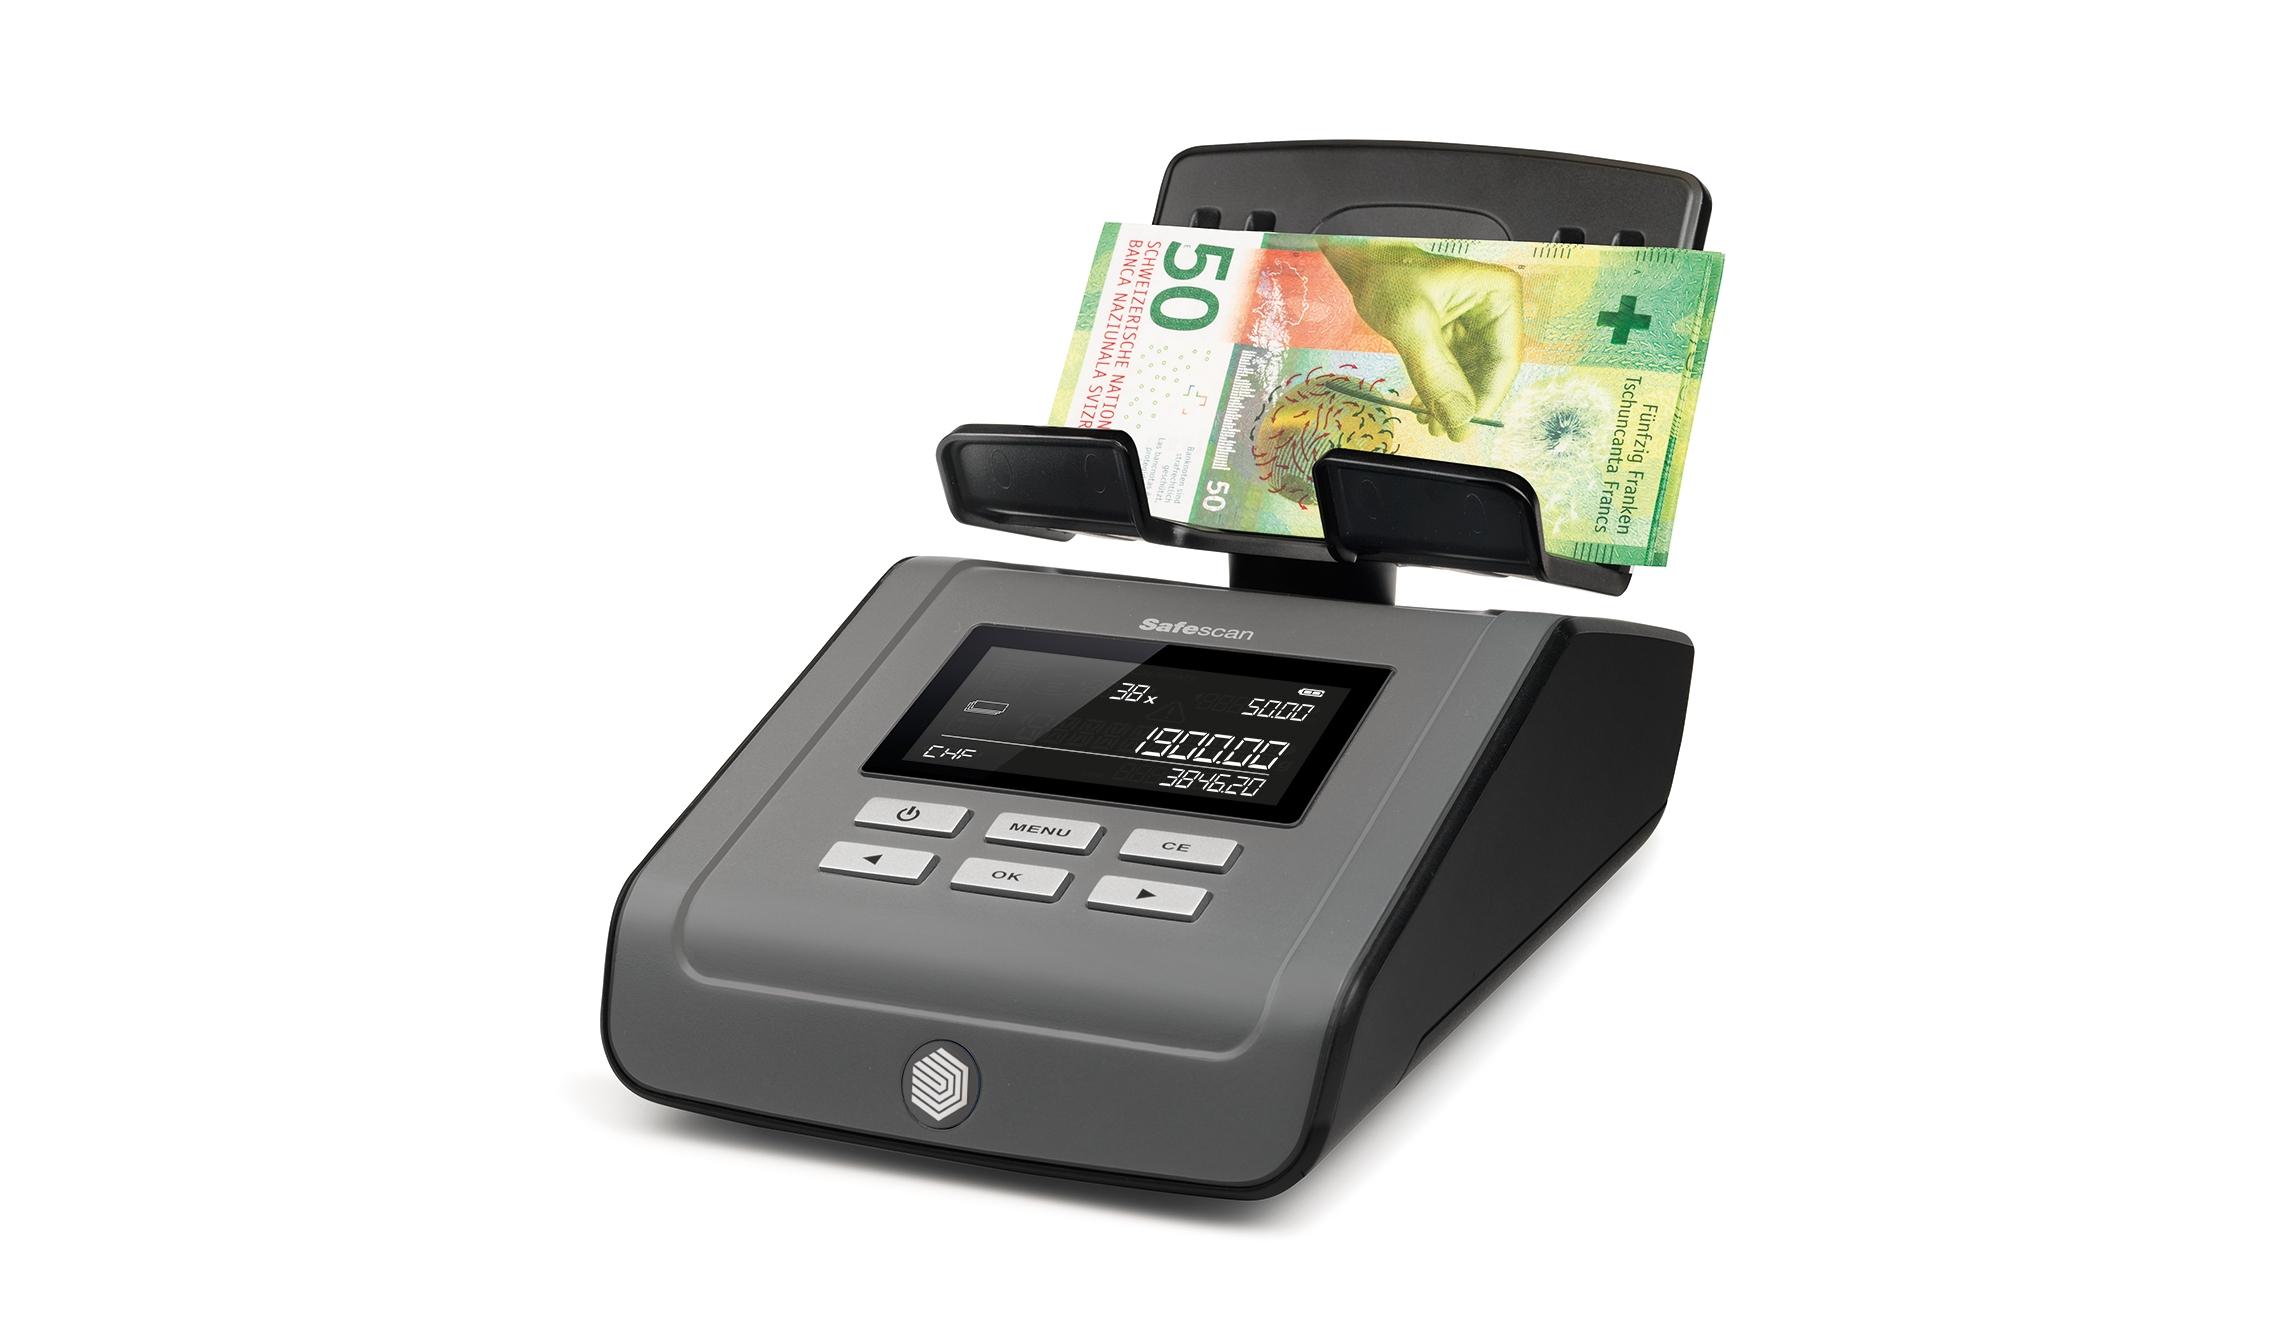 safescan-6165-bilancia-conta-soldi